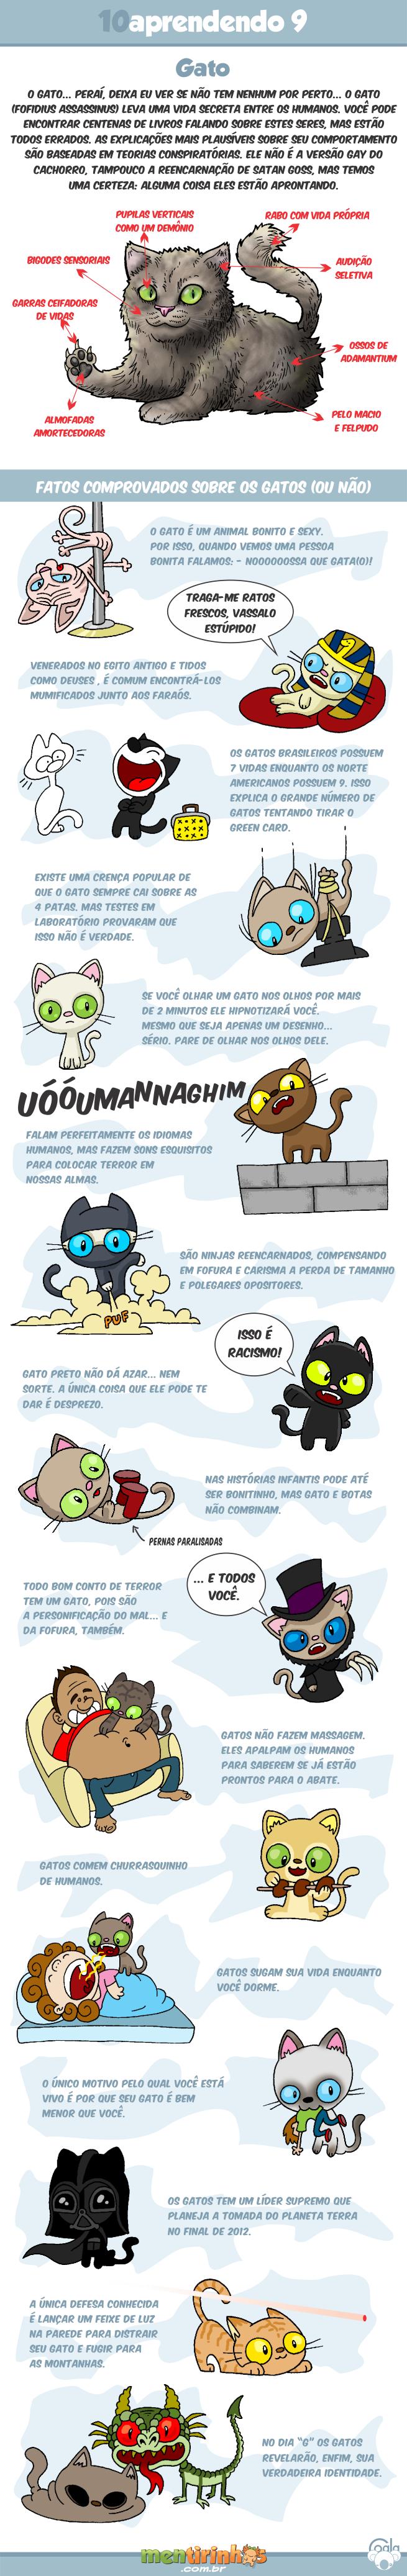 10aprendendo9_gatos